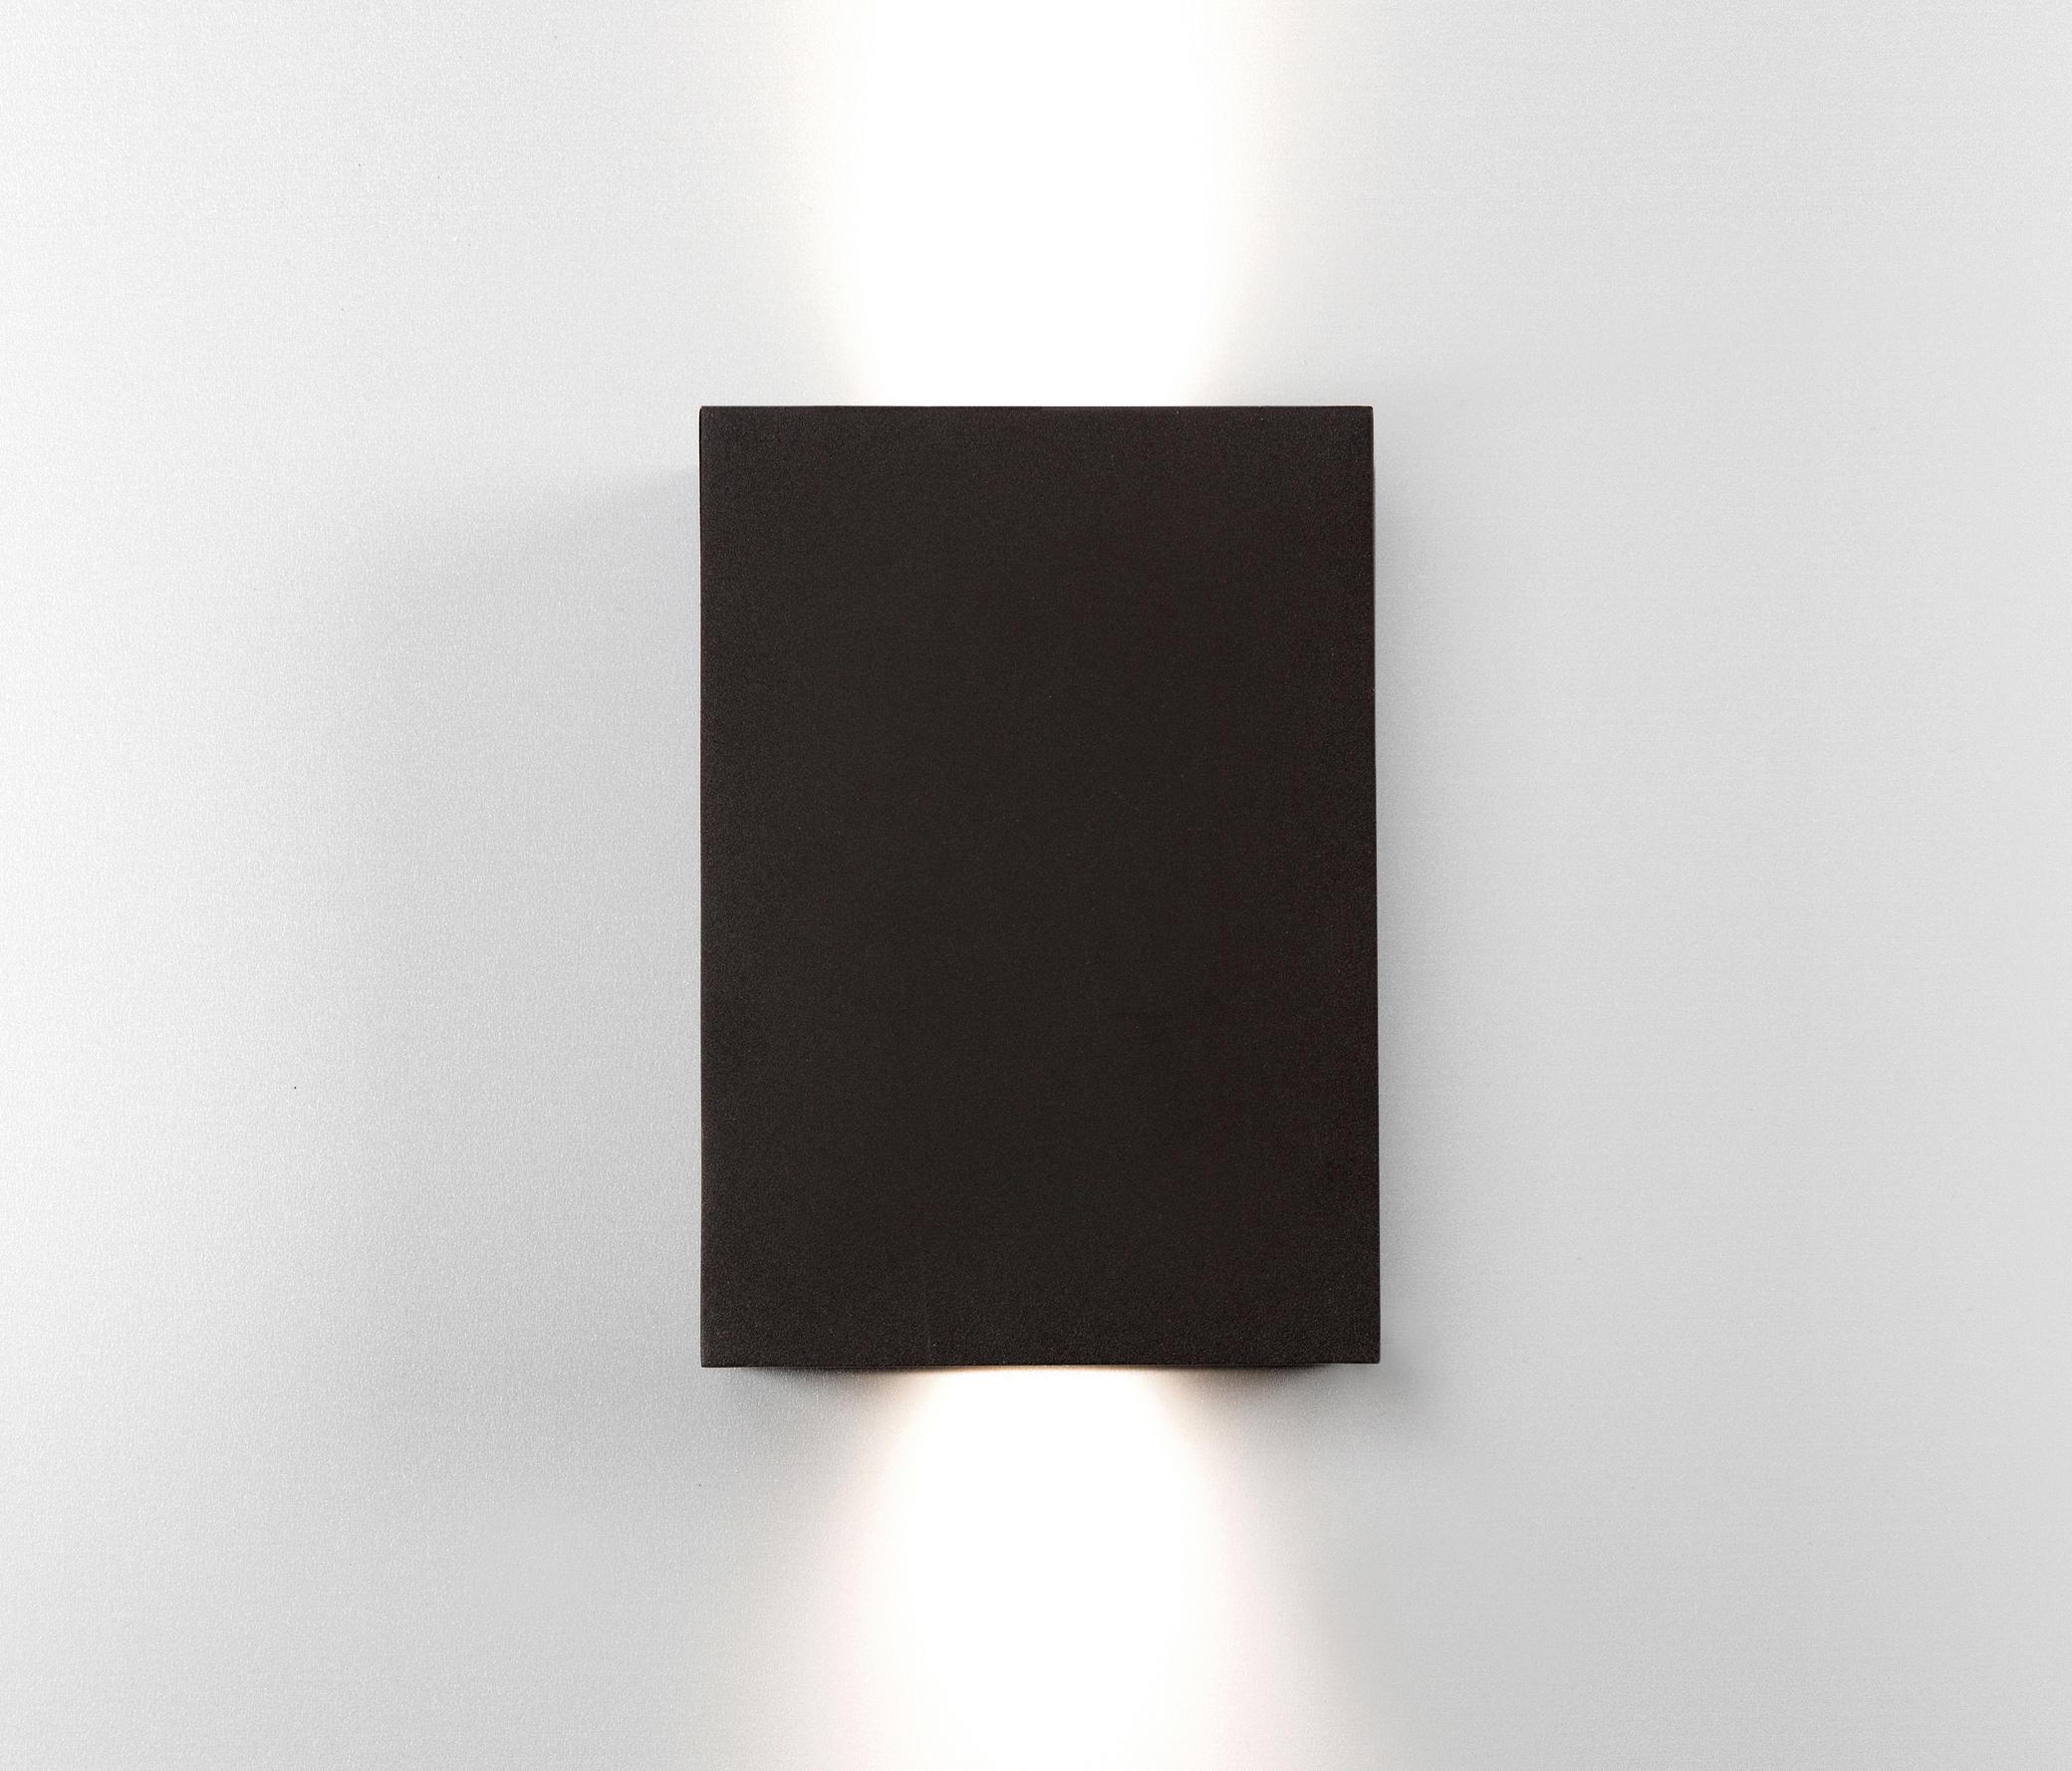 SULFER LED TRE DIM GI - Allgemeinbeleuchtung von Modular Lighting ...